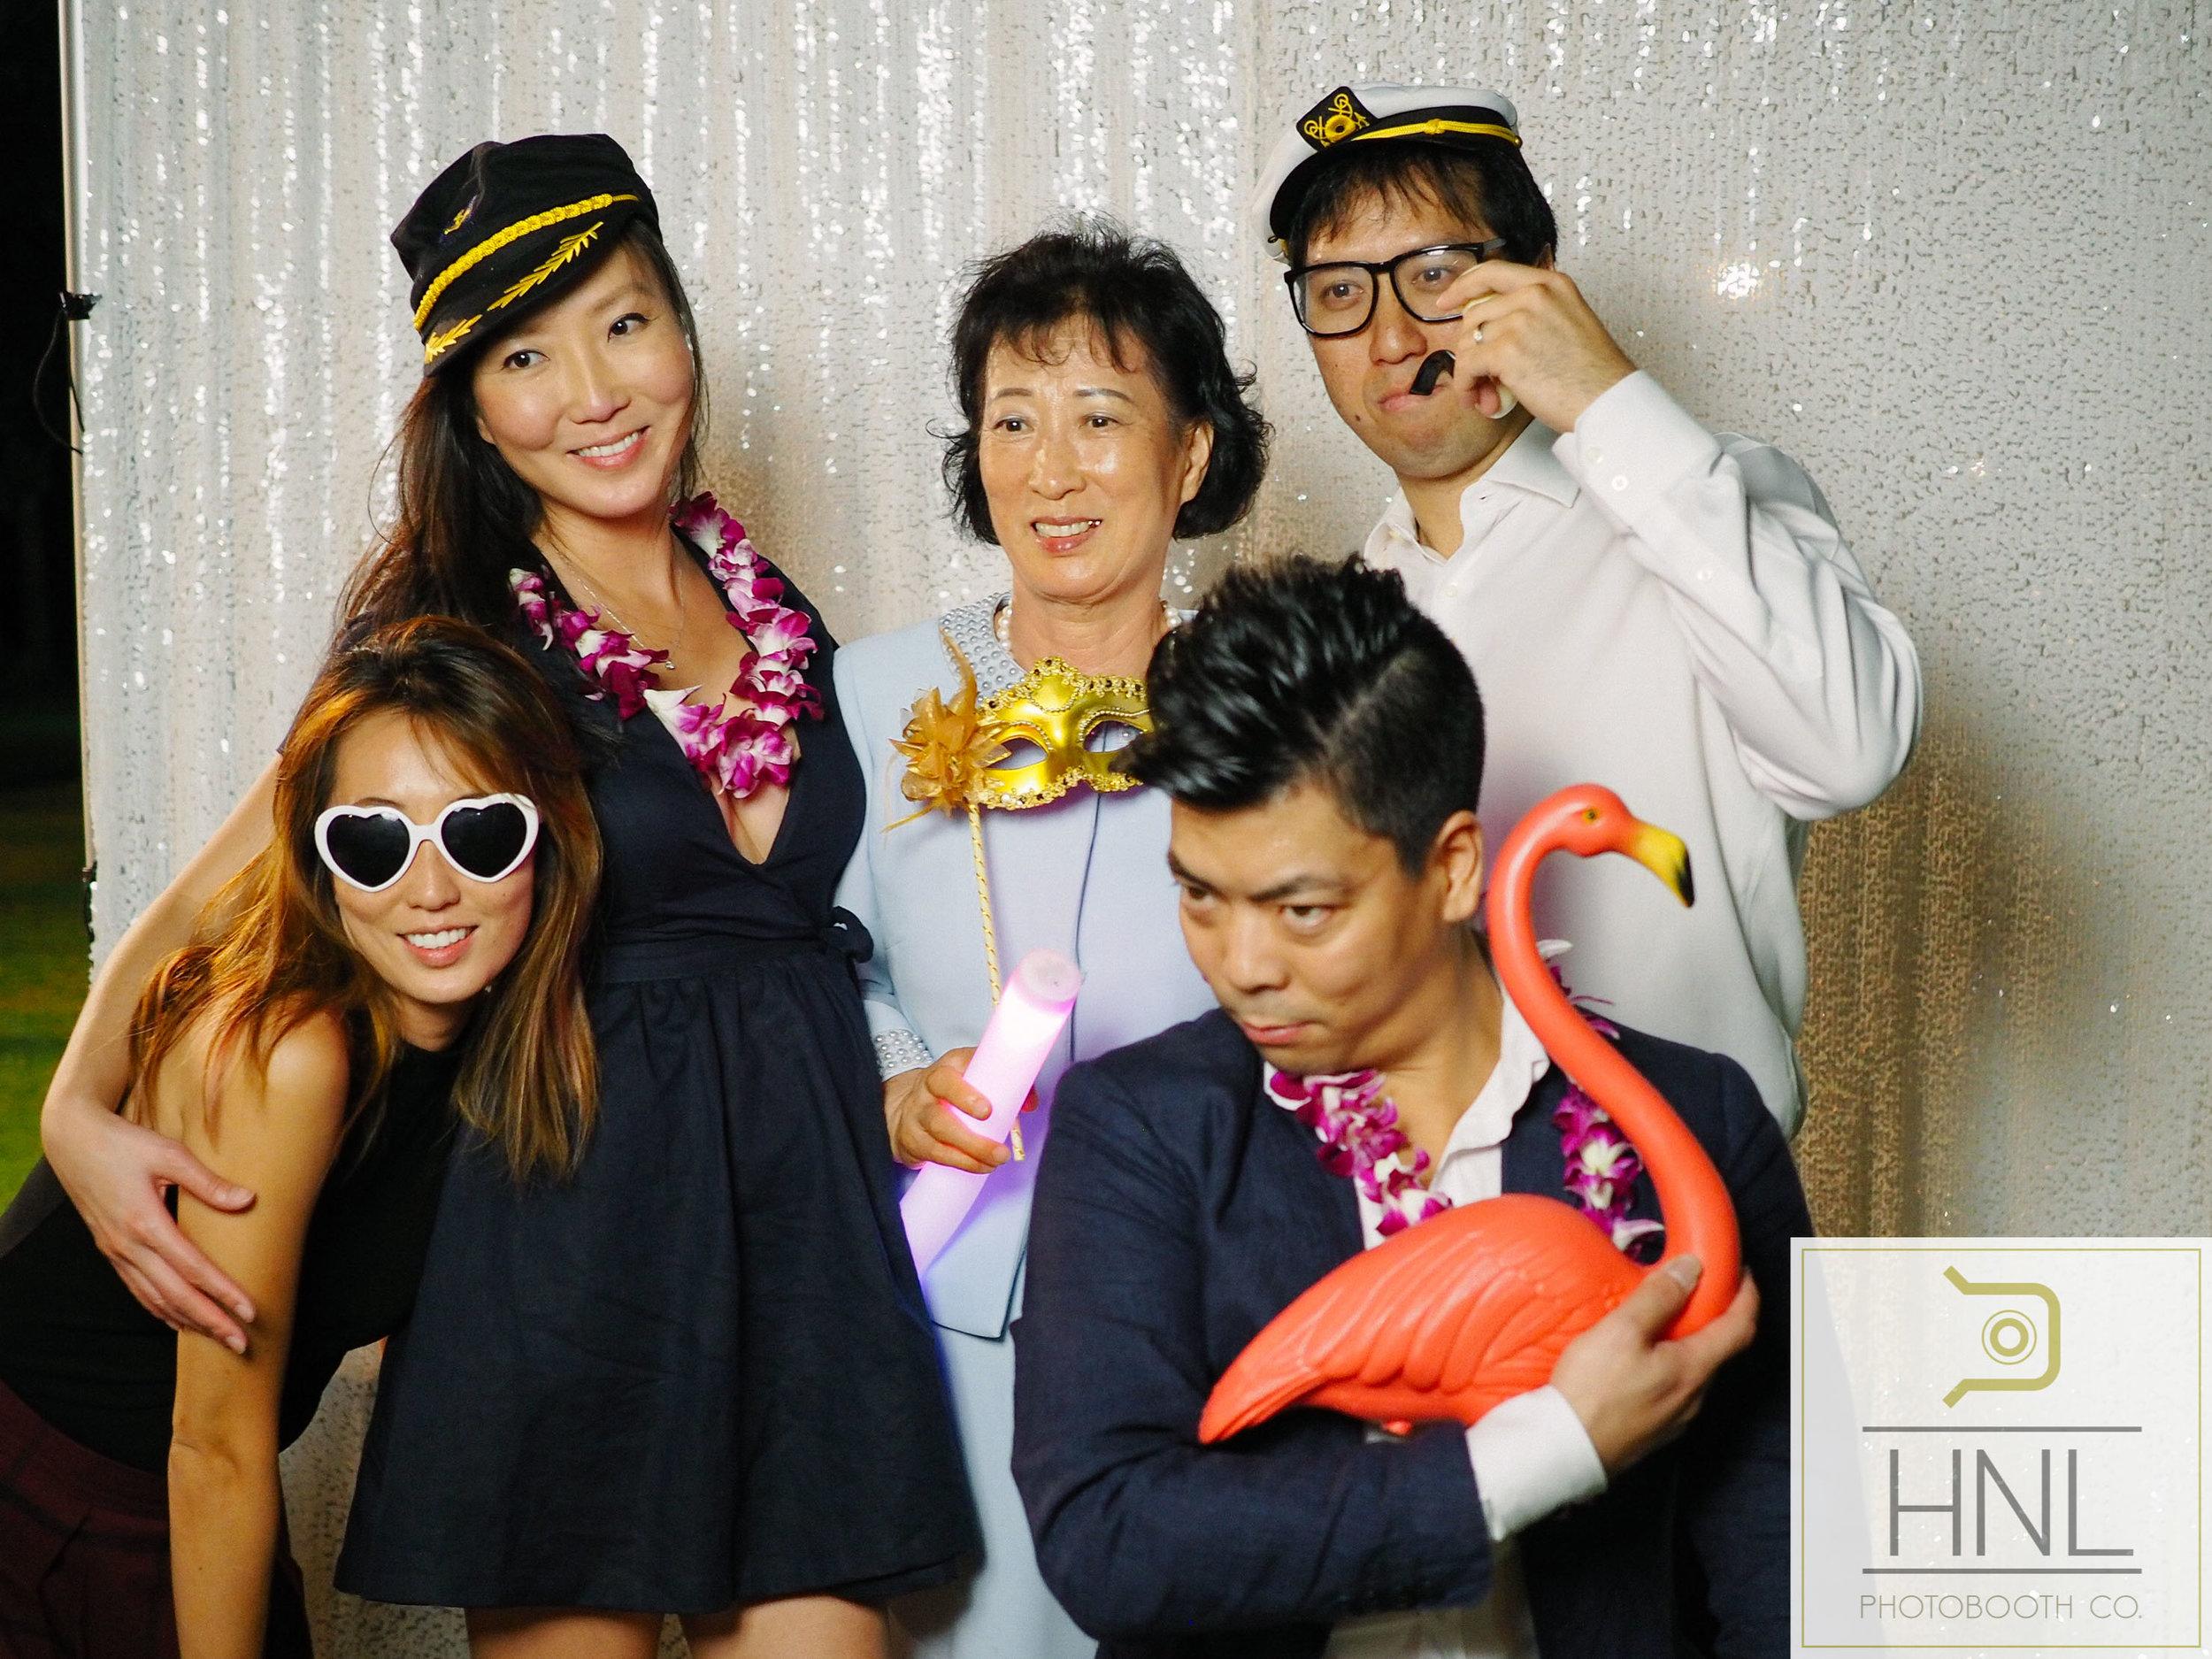 Miki and Dan wedding photo booth lanikohonua ko olina kapolei Oahu Hawaii -16.jpg